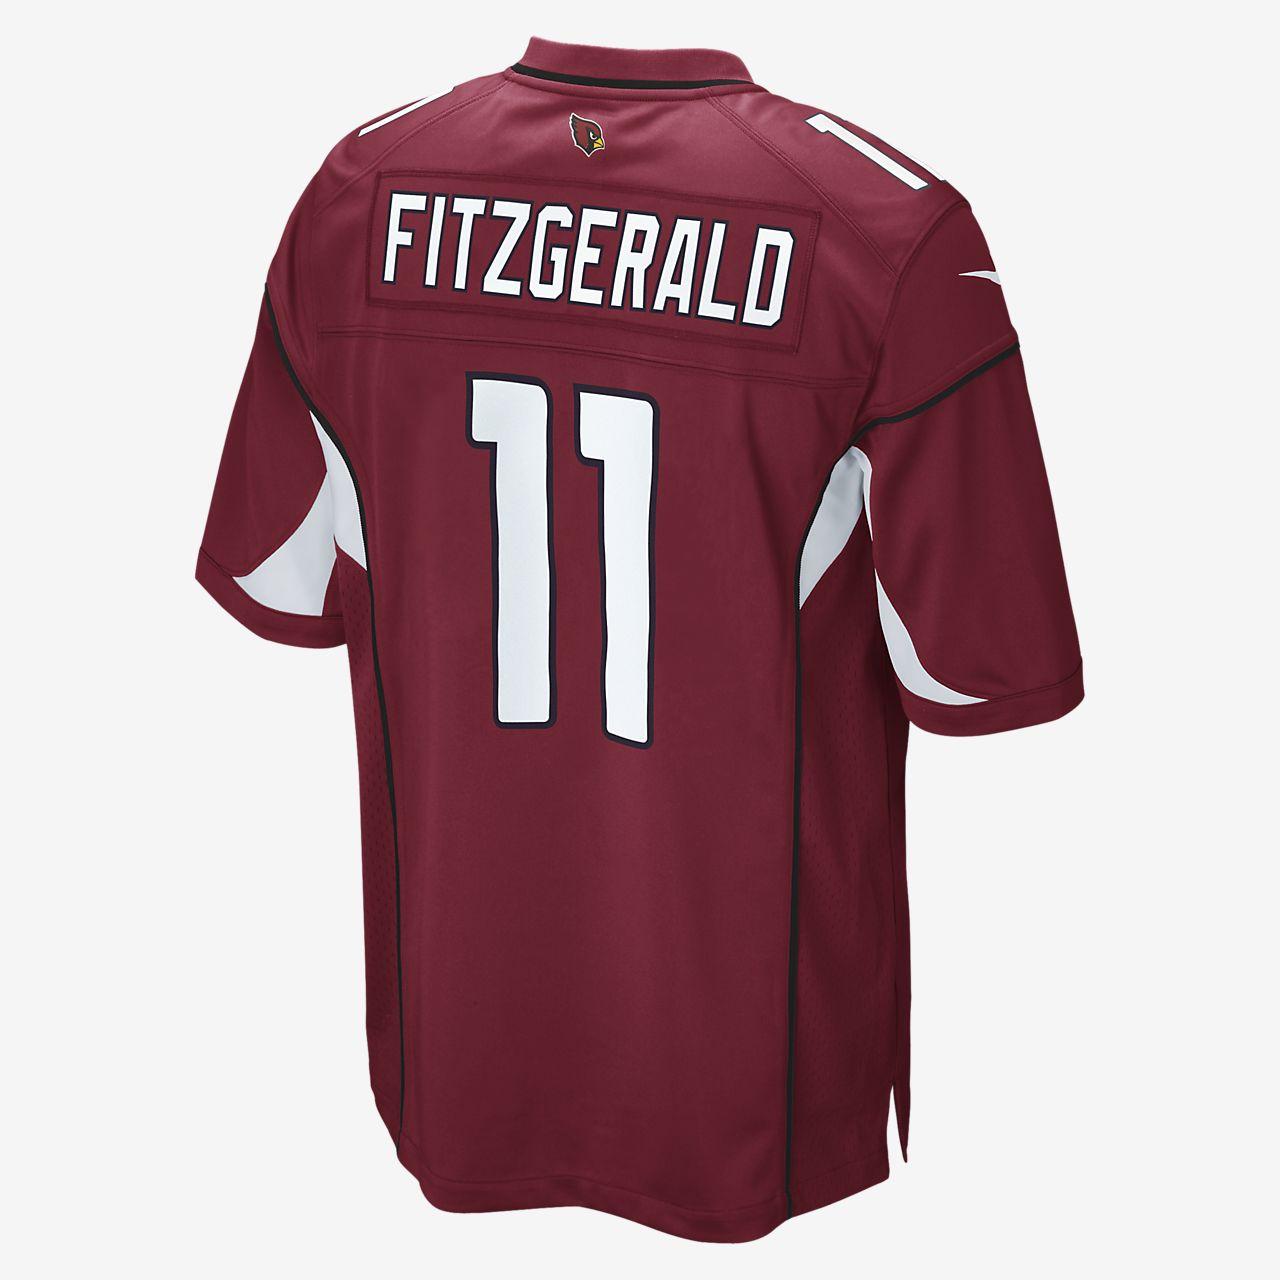 9ddb18918d18 NFL Arizona Cardinals (Larry Fitzgerald) Men s American Football ...